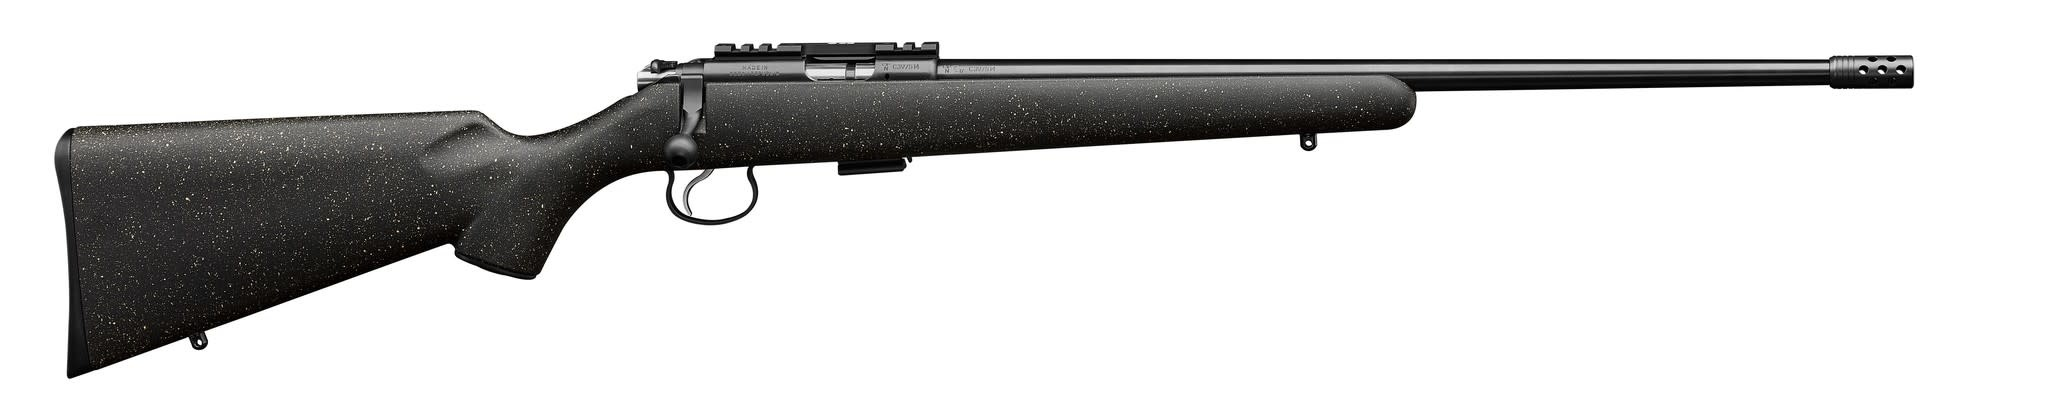 "CZ 455 Night Sky .22LR 20"" barrel w/ compensator"